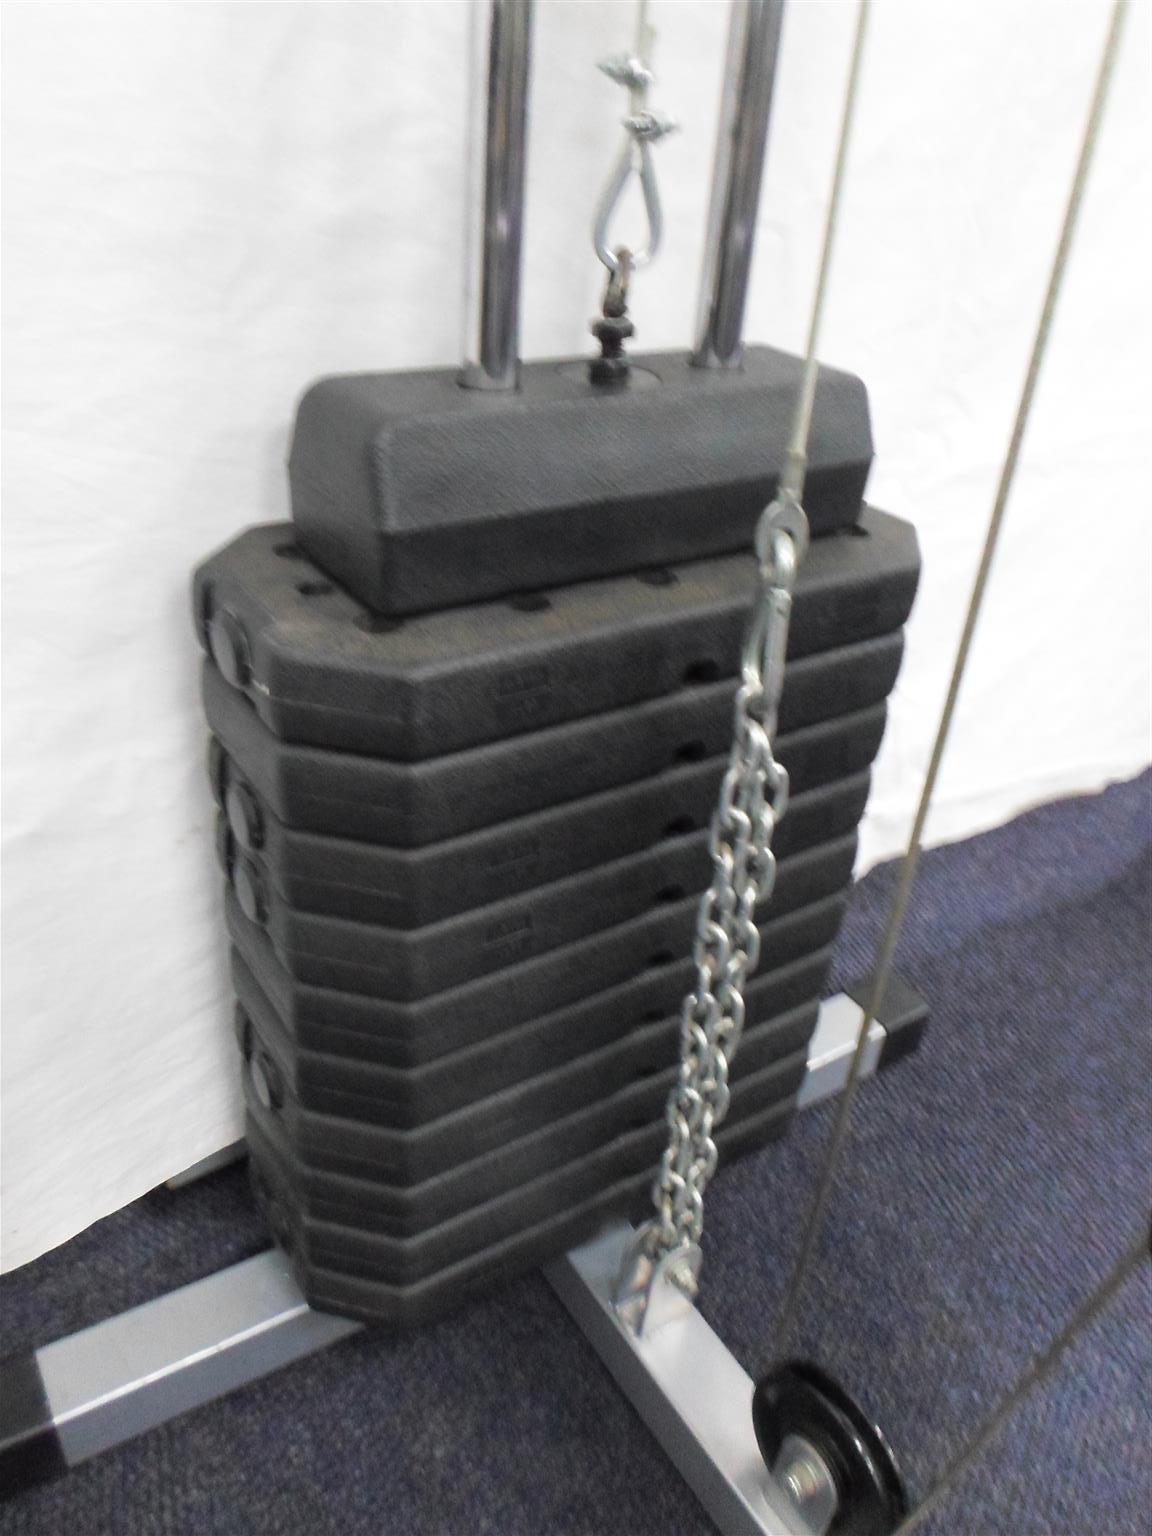 Trojan Dominator Home Gym